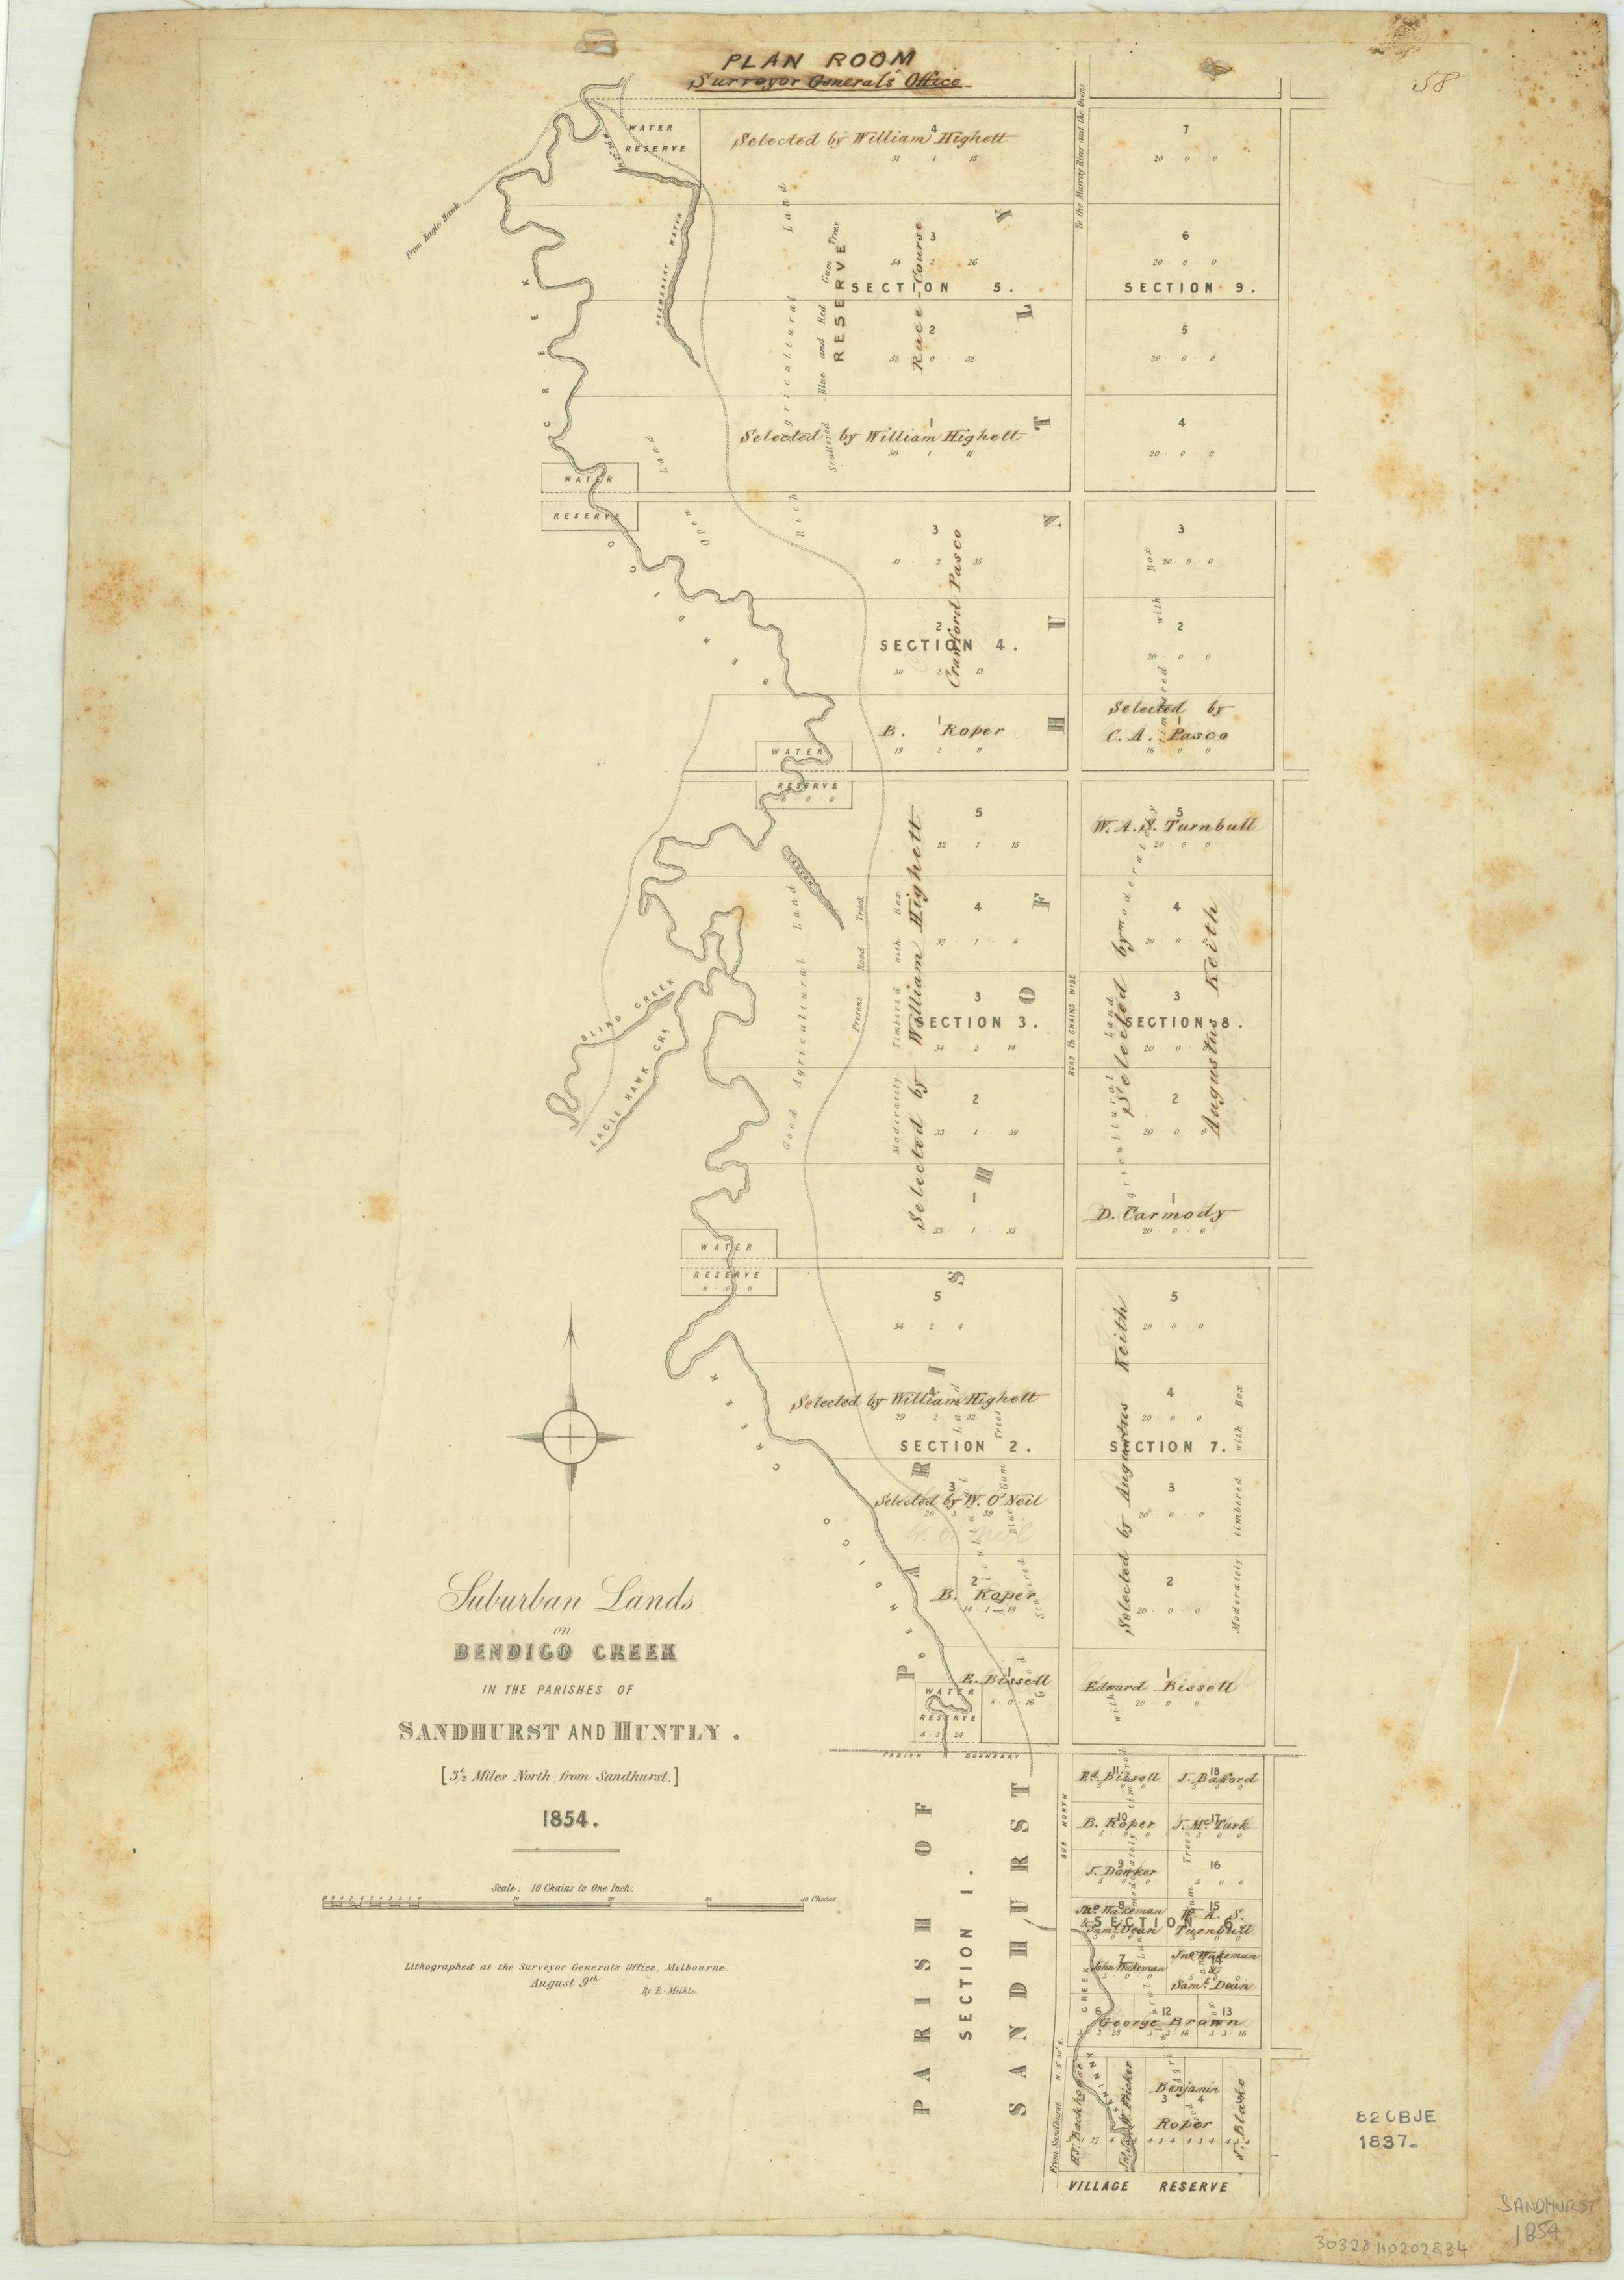 Suburban-lands-on-Bendigo-Creek-in-the-parishes-of-Sandhurst-and-Huntly-3-12-miles-north-from-Sandhurst-1854.jpg